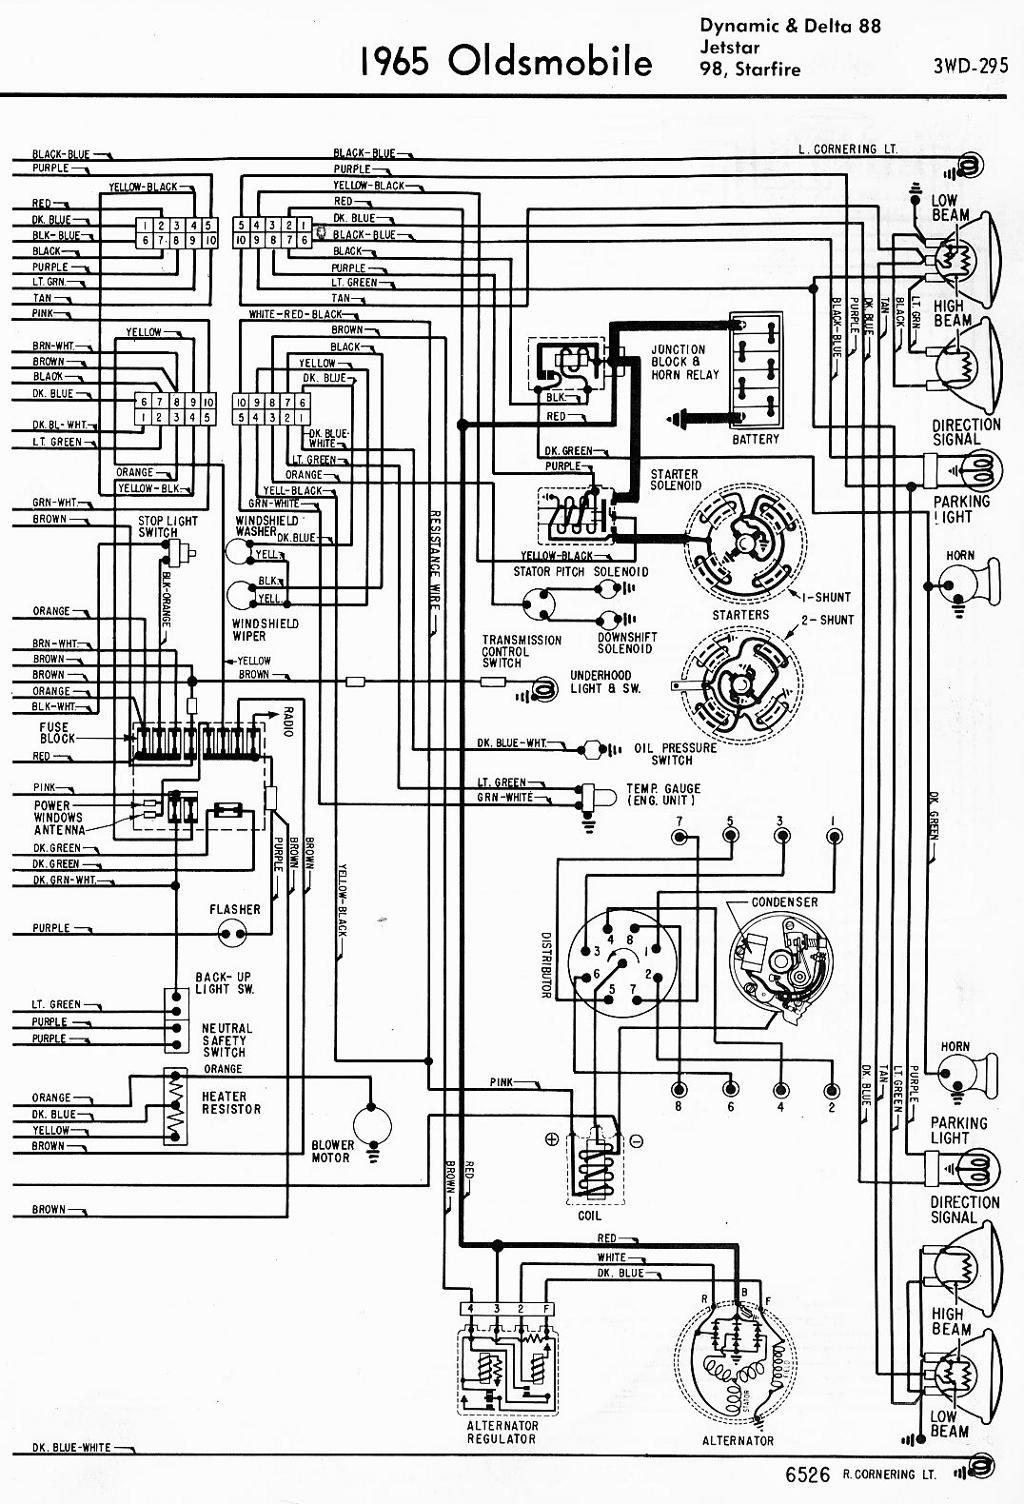 medium resolution of nissan tiida air con wiring diagram wiring schematic 1987 nissan pickup wiring diagram nissan tiida a c